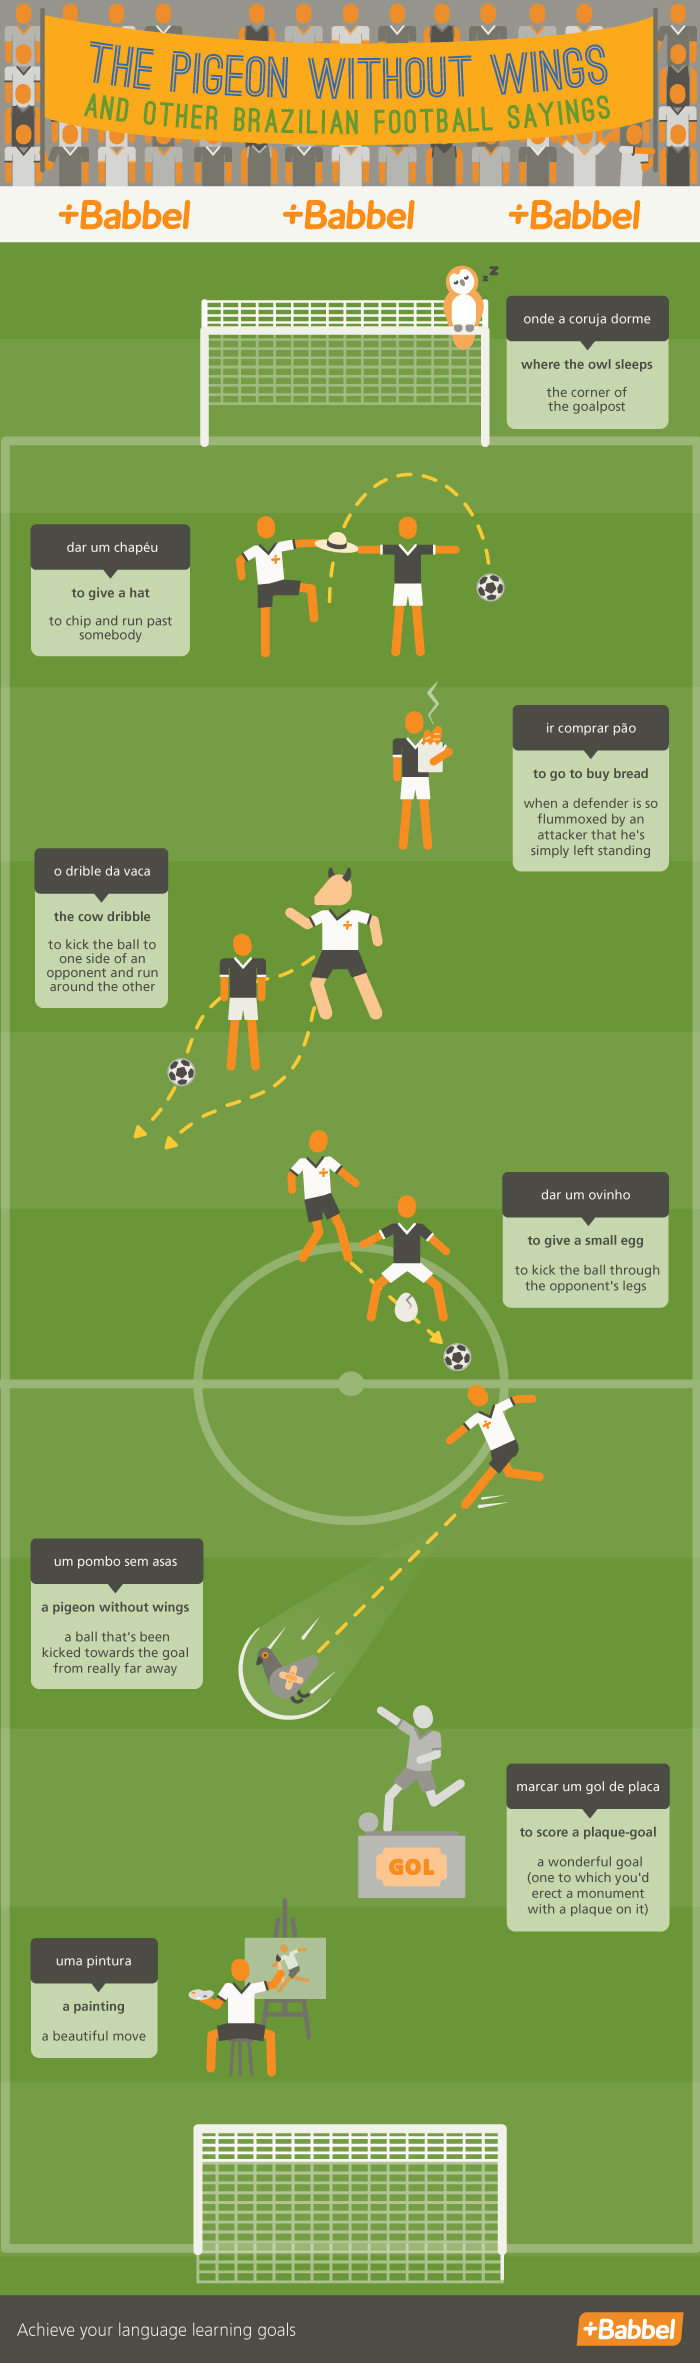 The Brazilian Soccer Infographic